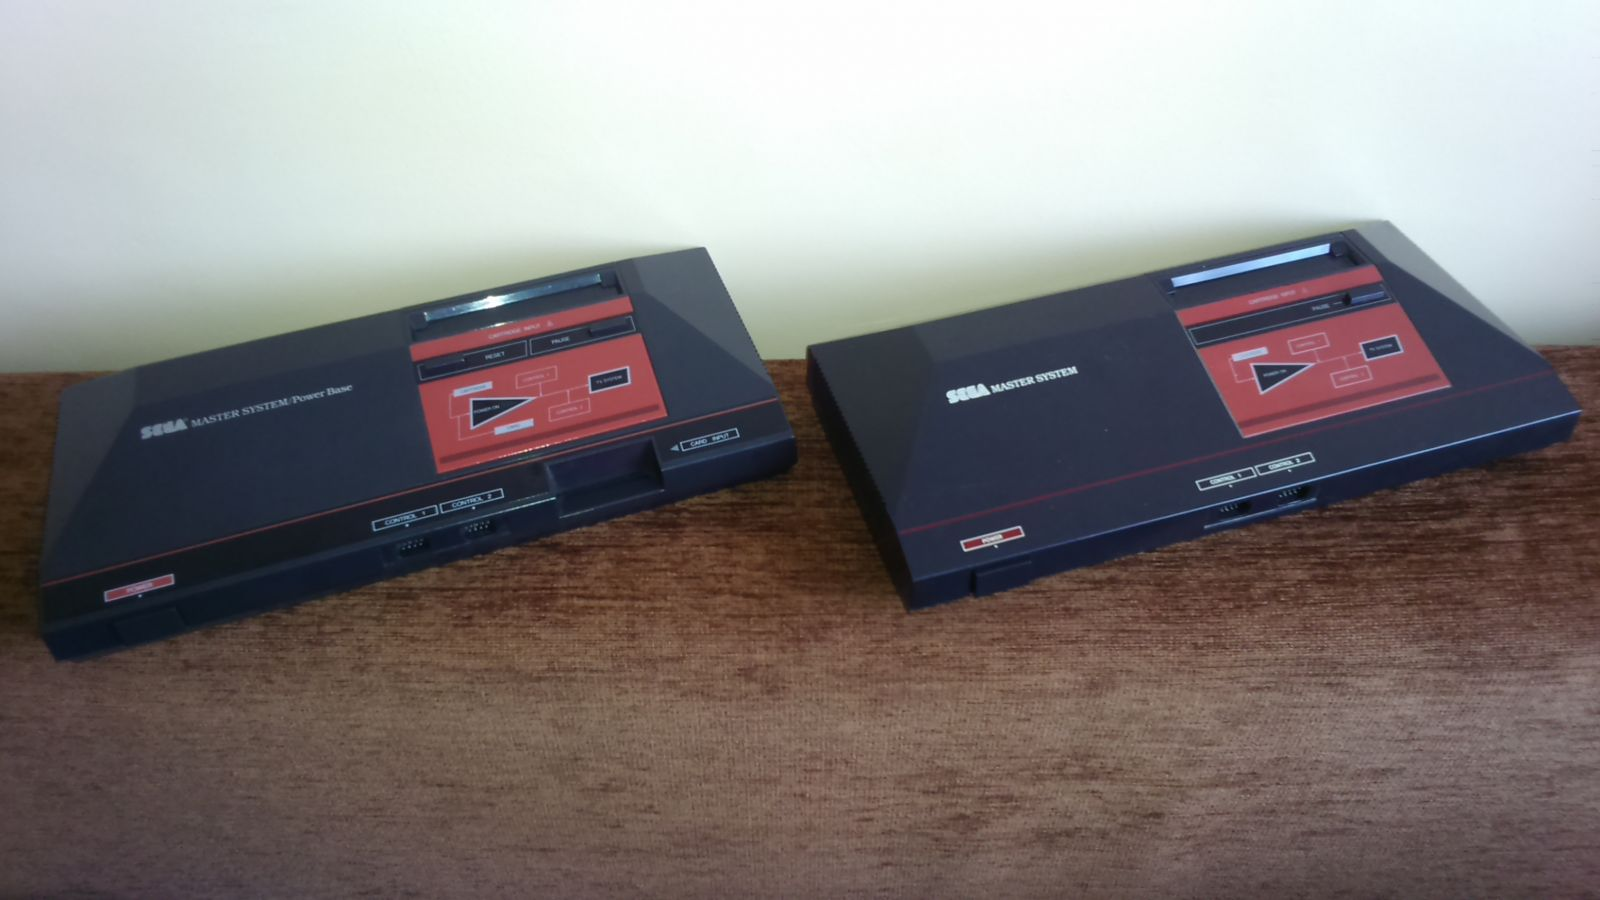 SEGA Master System (rask penkis skirtumus)